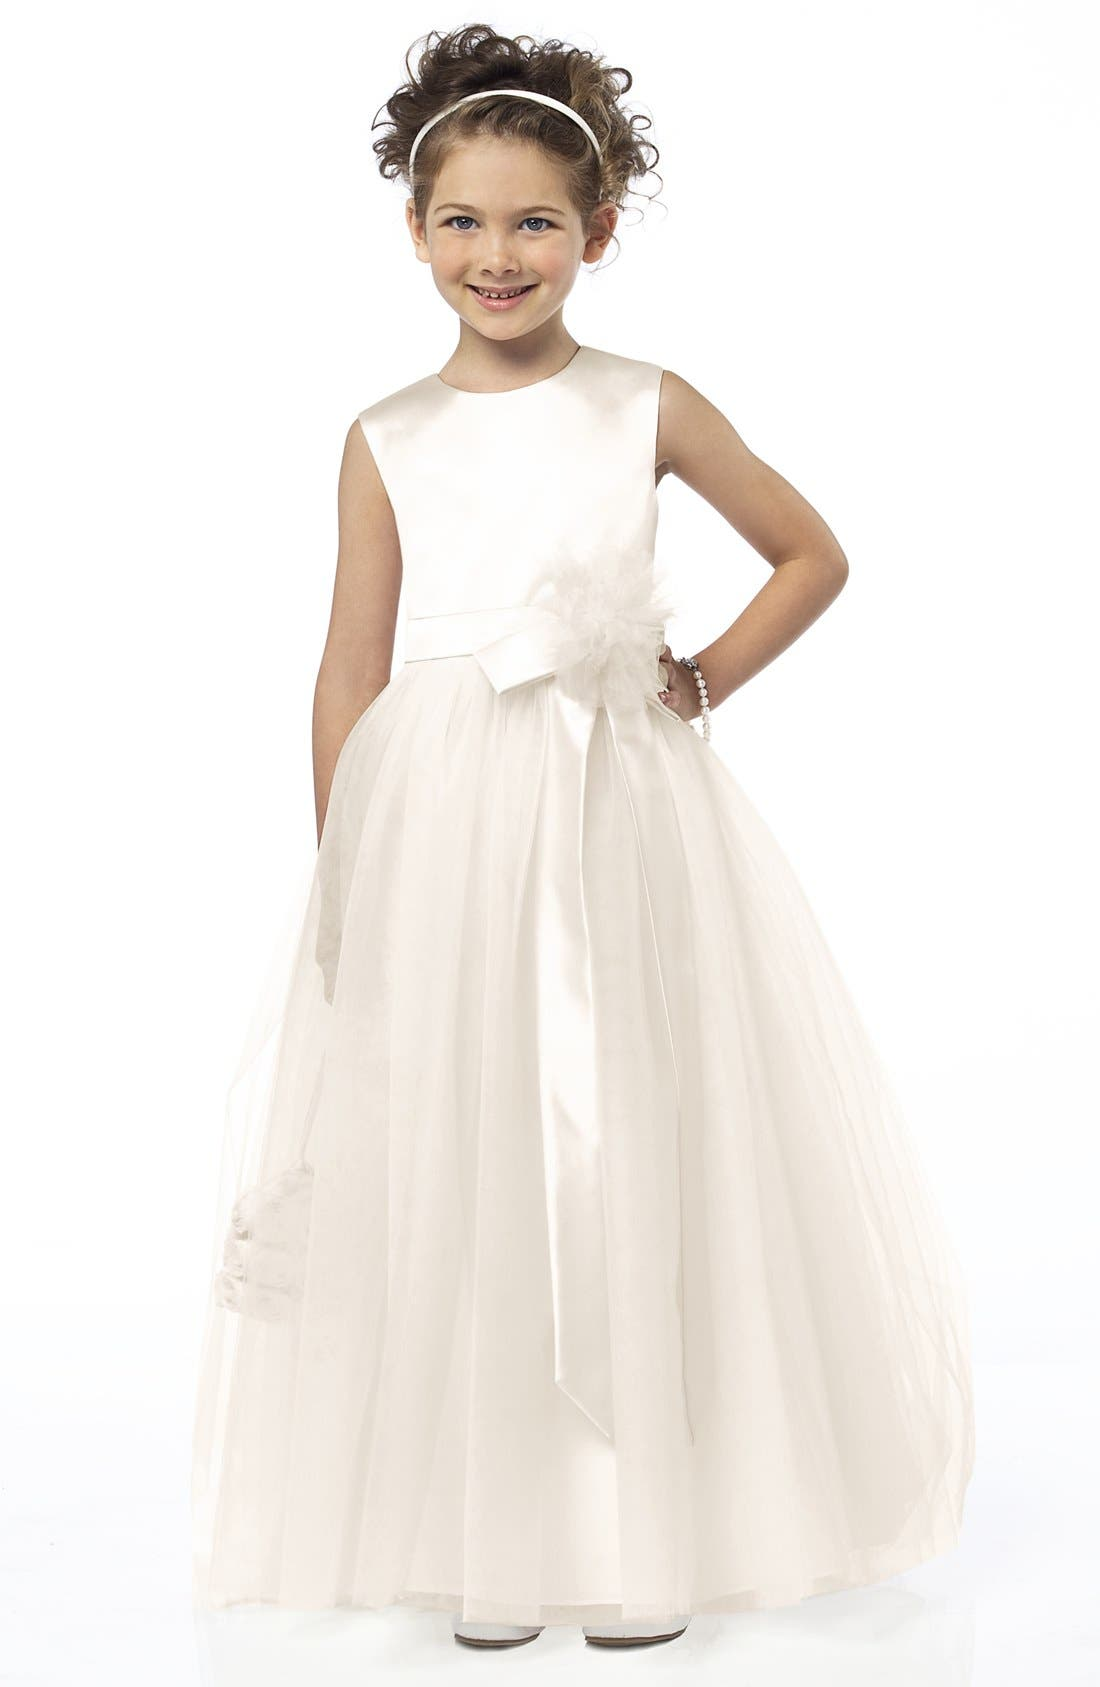 DESSY COLLECTION Sleeveless Satin & Tulle Flower Girl Dress